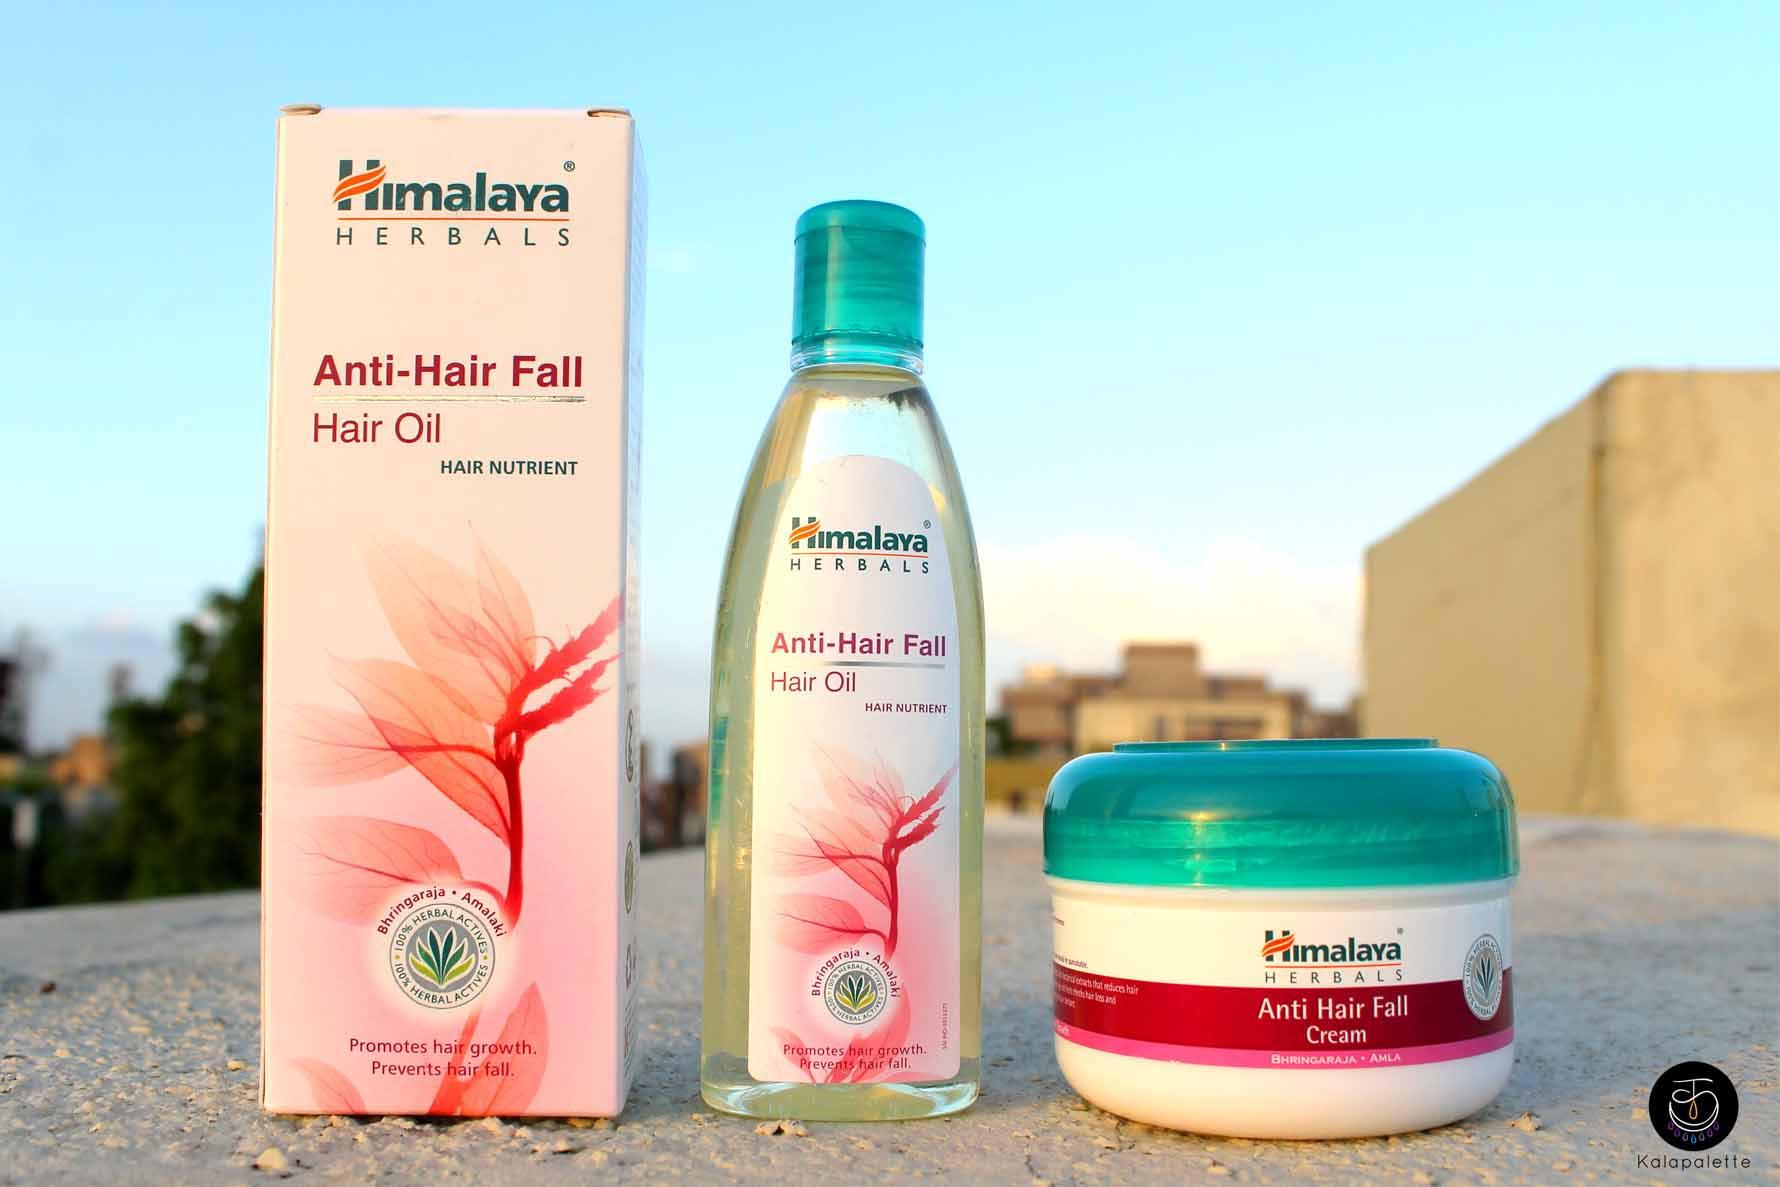 Himalaya Herbals Hair Care Range Review - Kalapalette